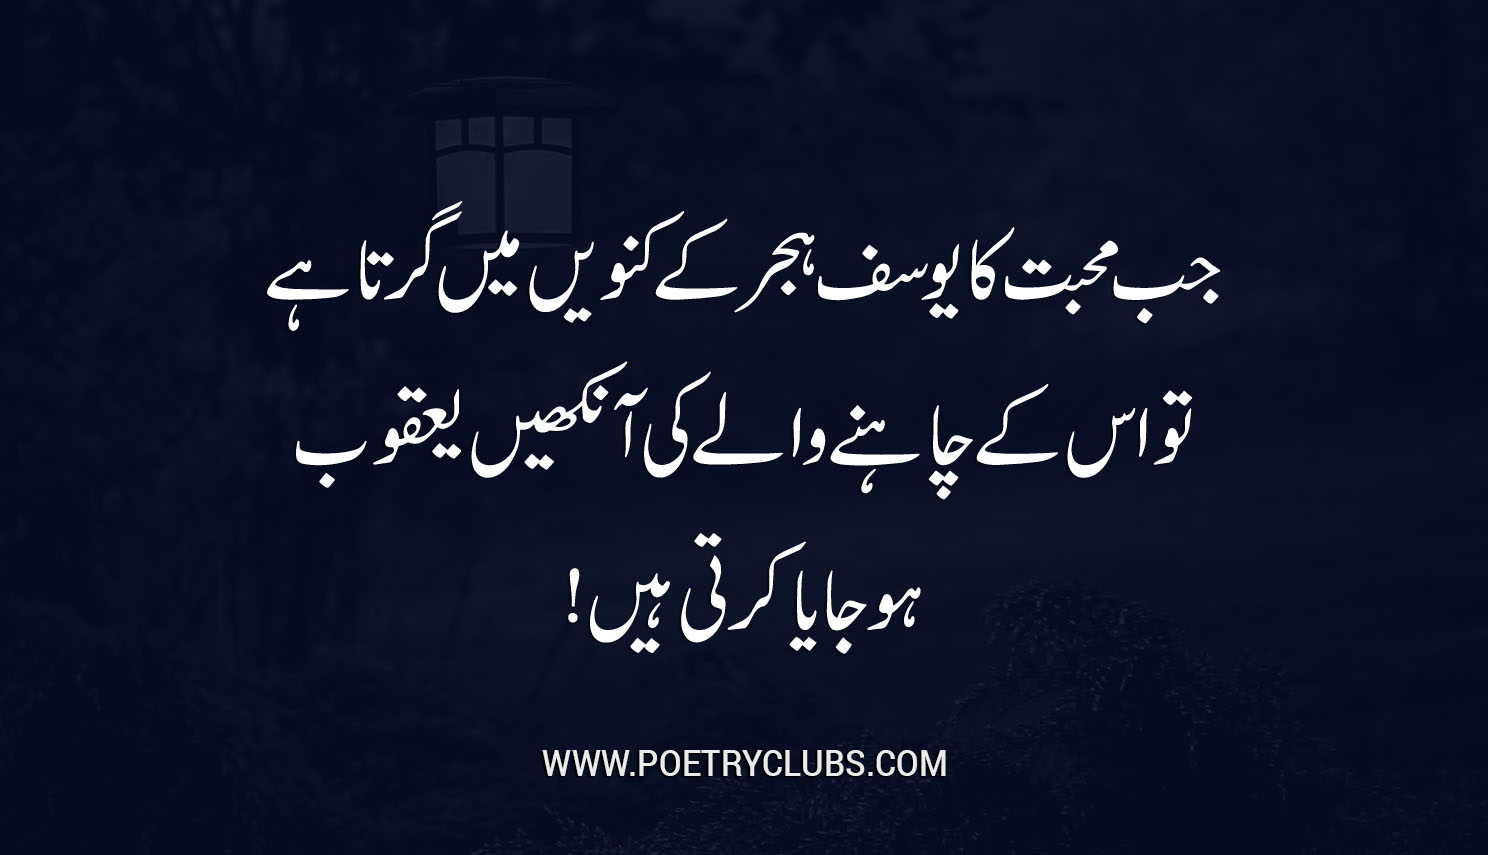 Quotes poets famous romantic The 40